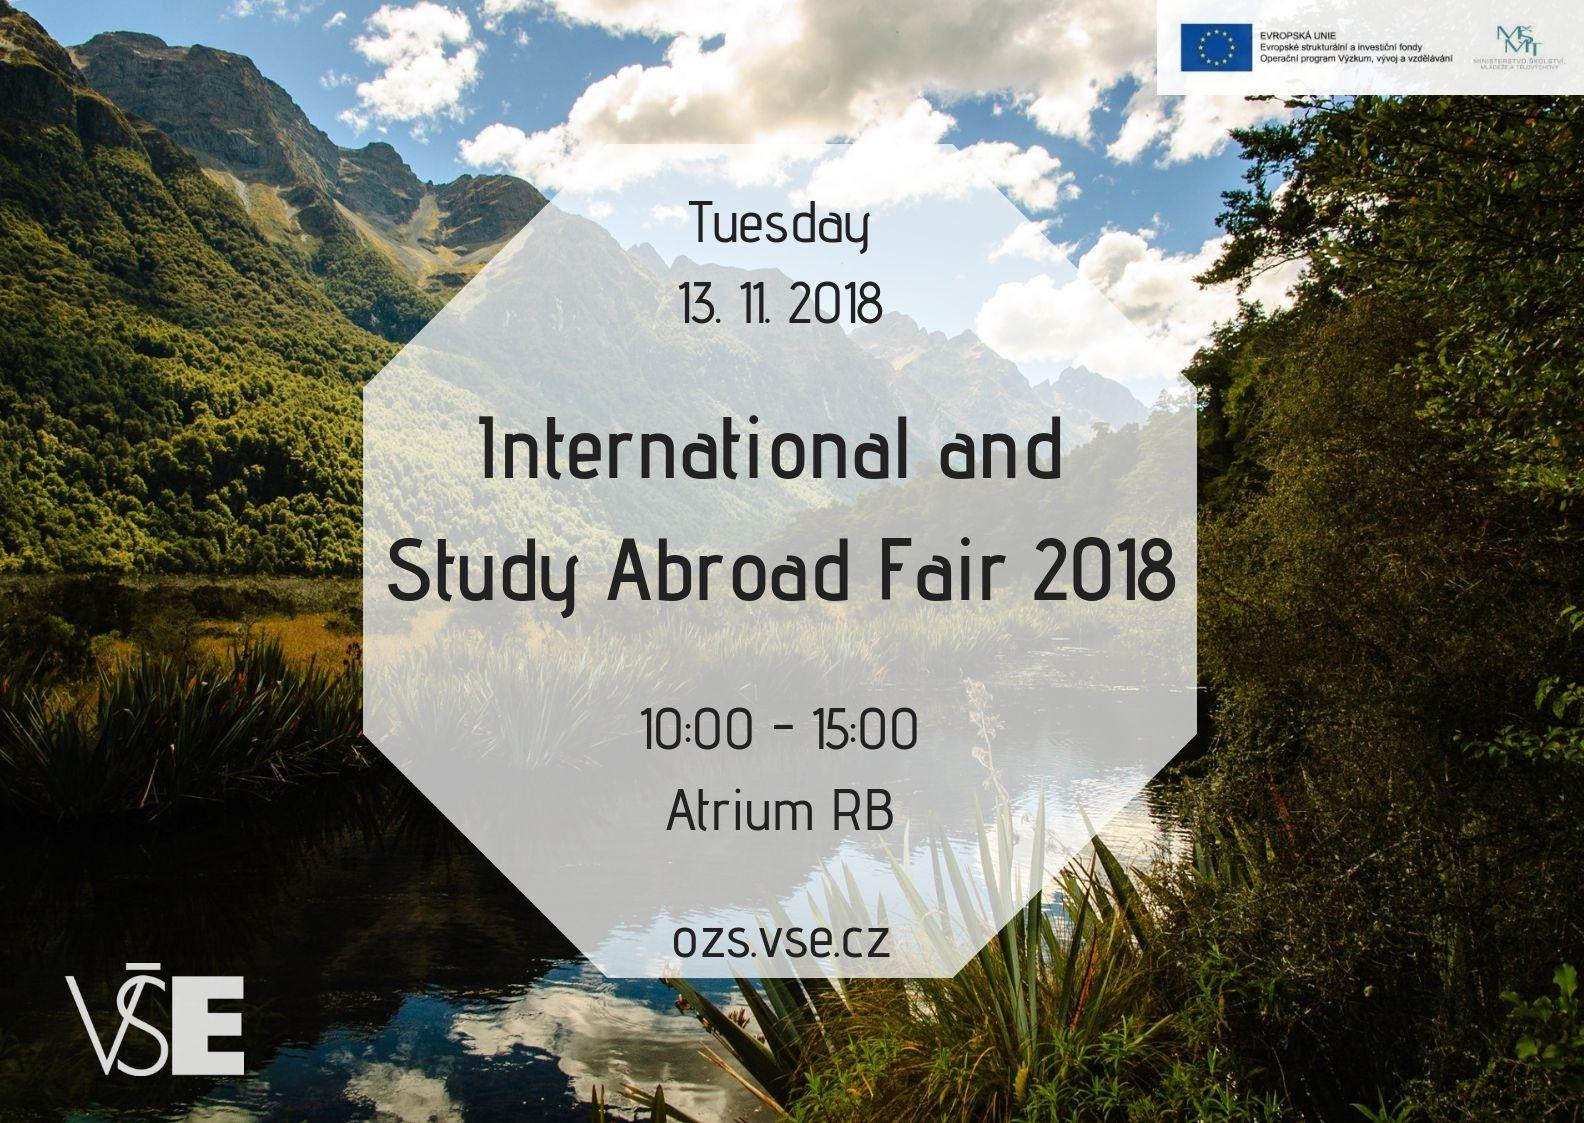 International & Study Abroad Fair